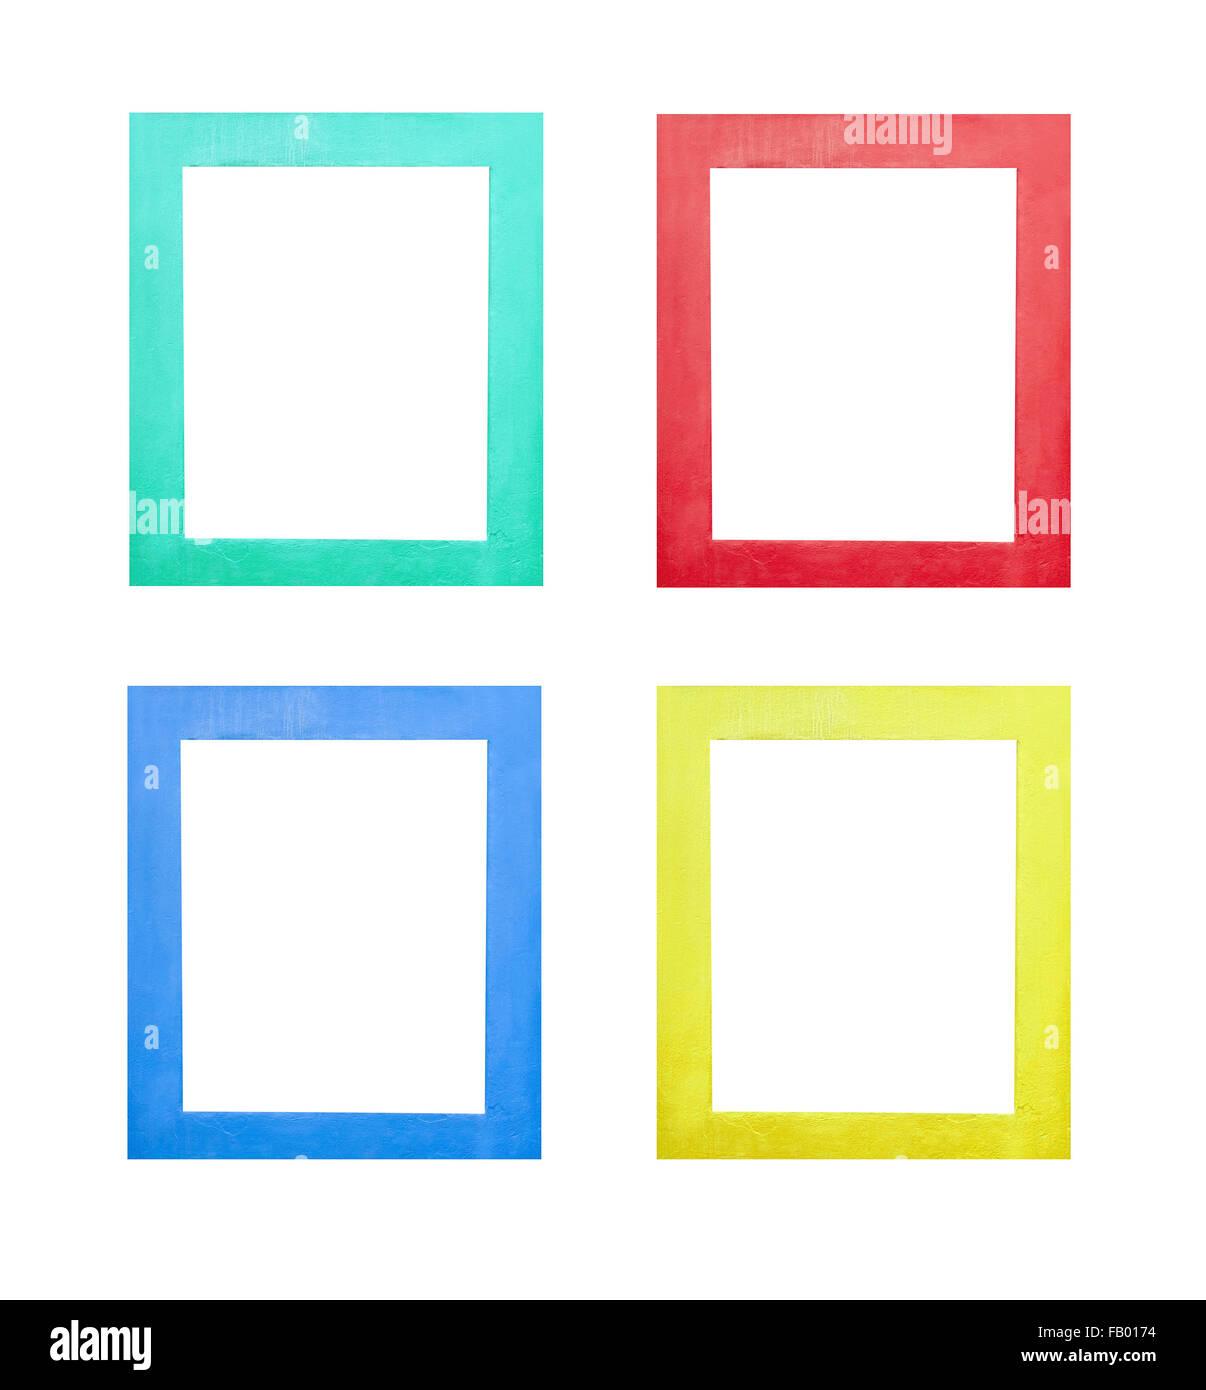 Green Window Frames Imágenes De Stock & Green Window Frames Fotos De ...